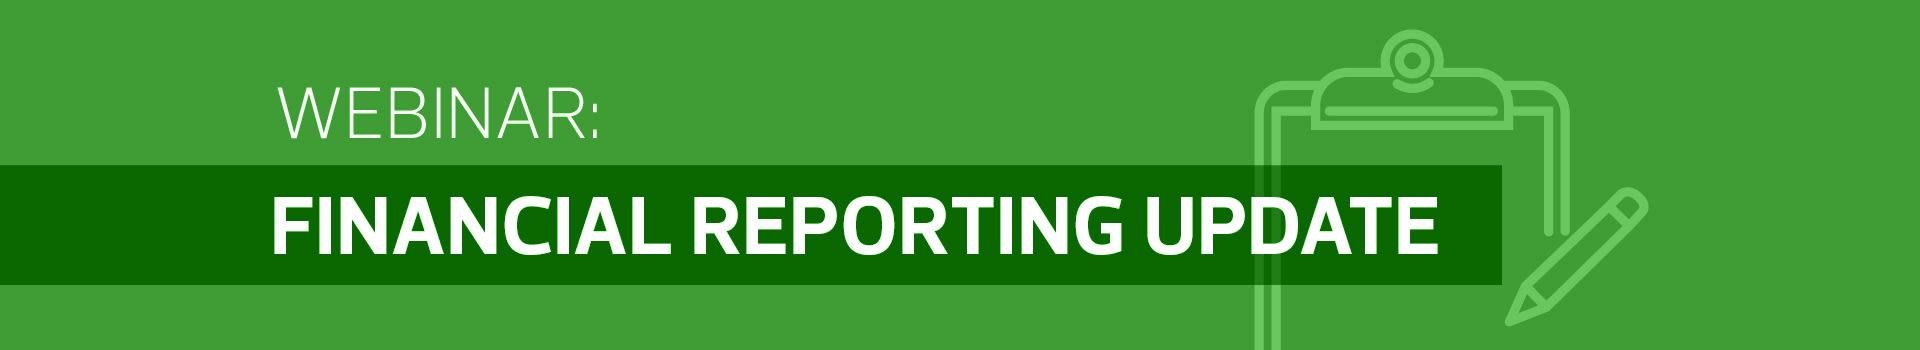 Financial Reporting Update